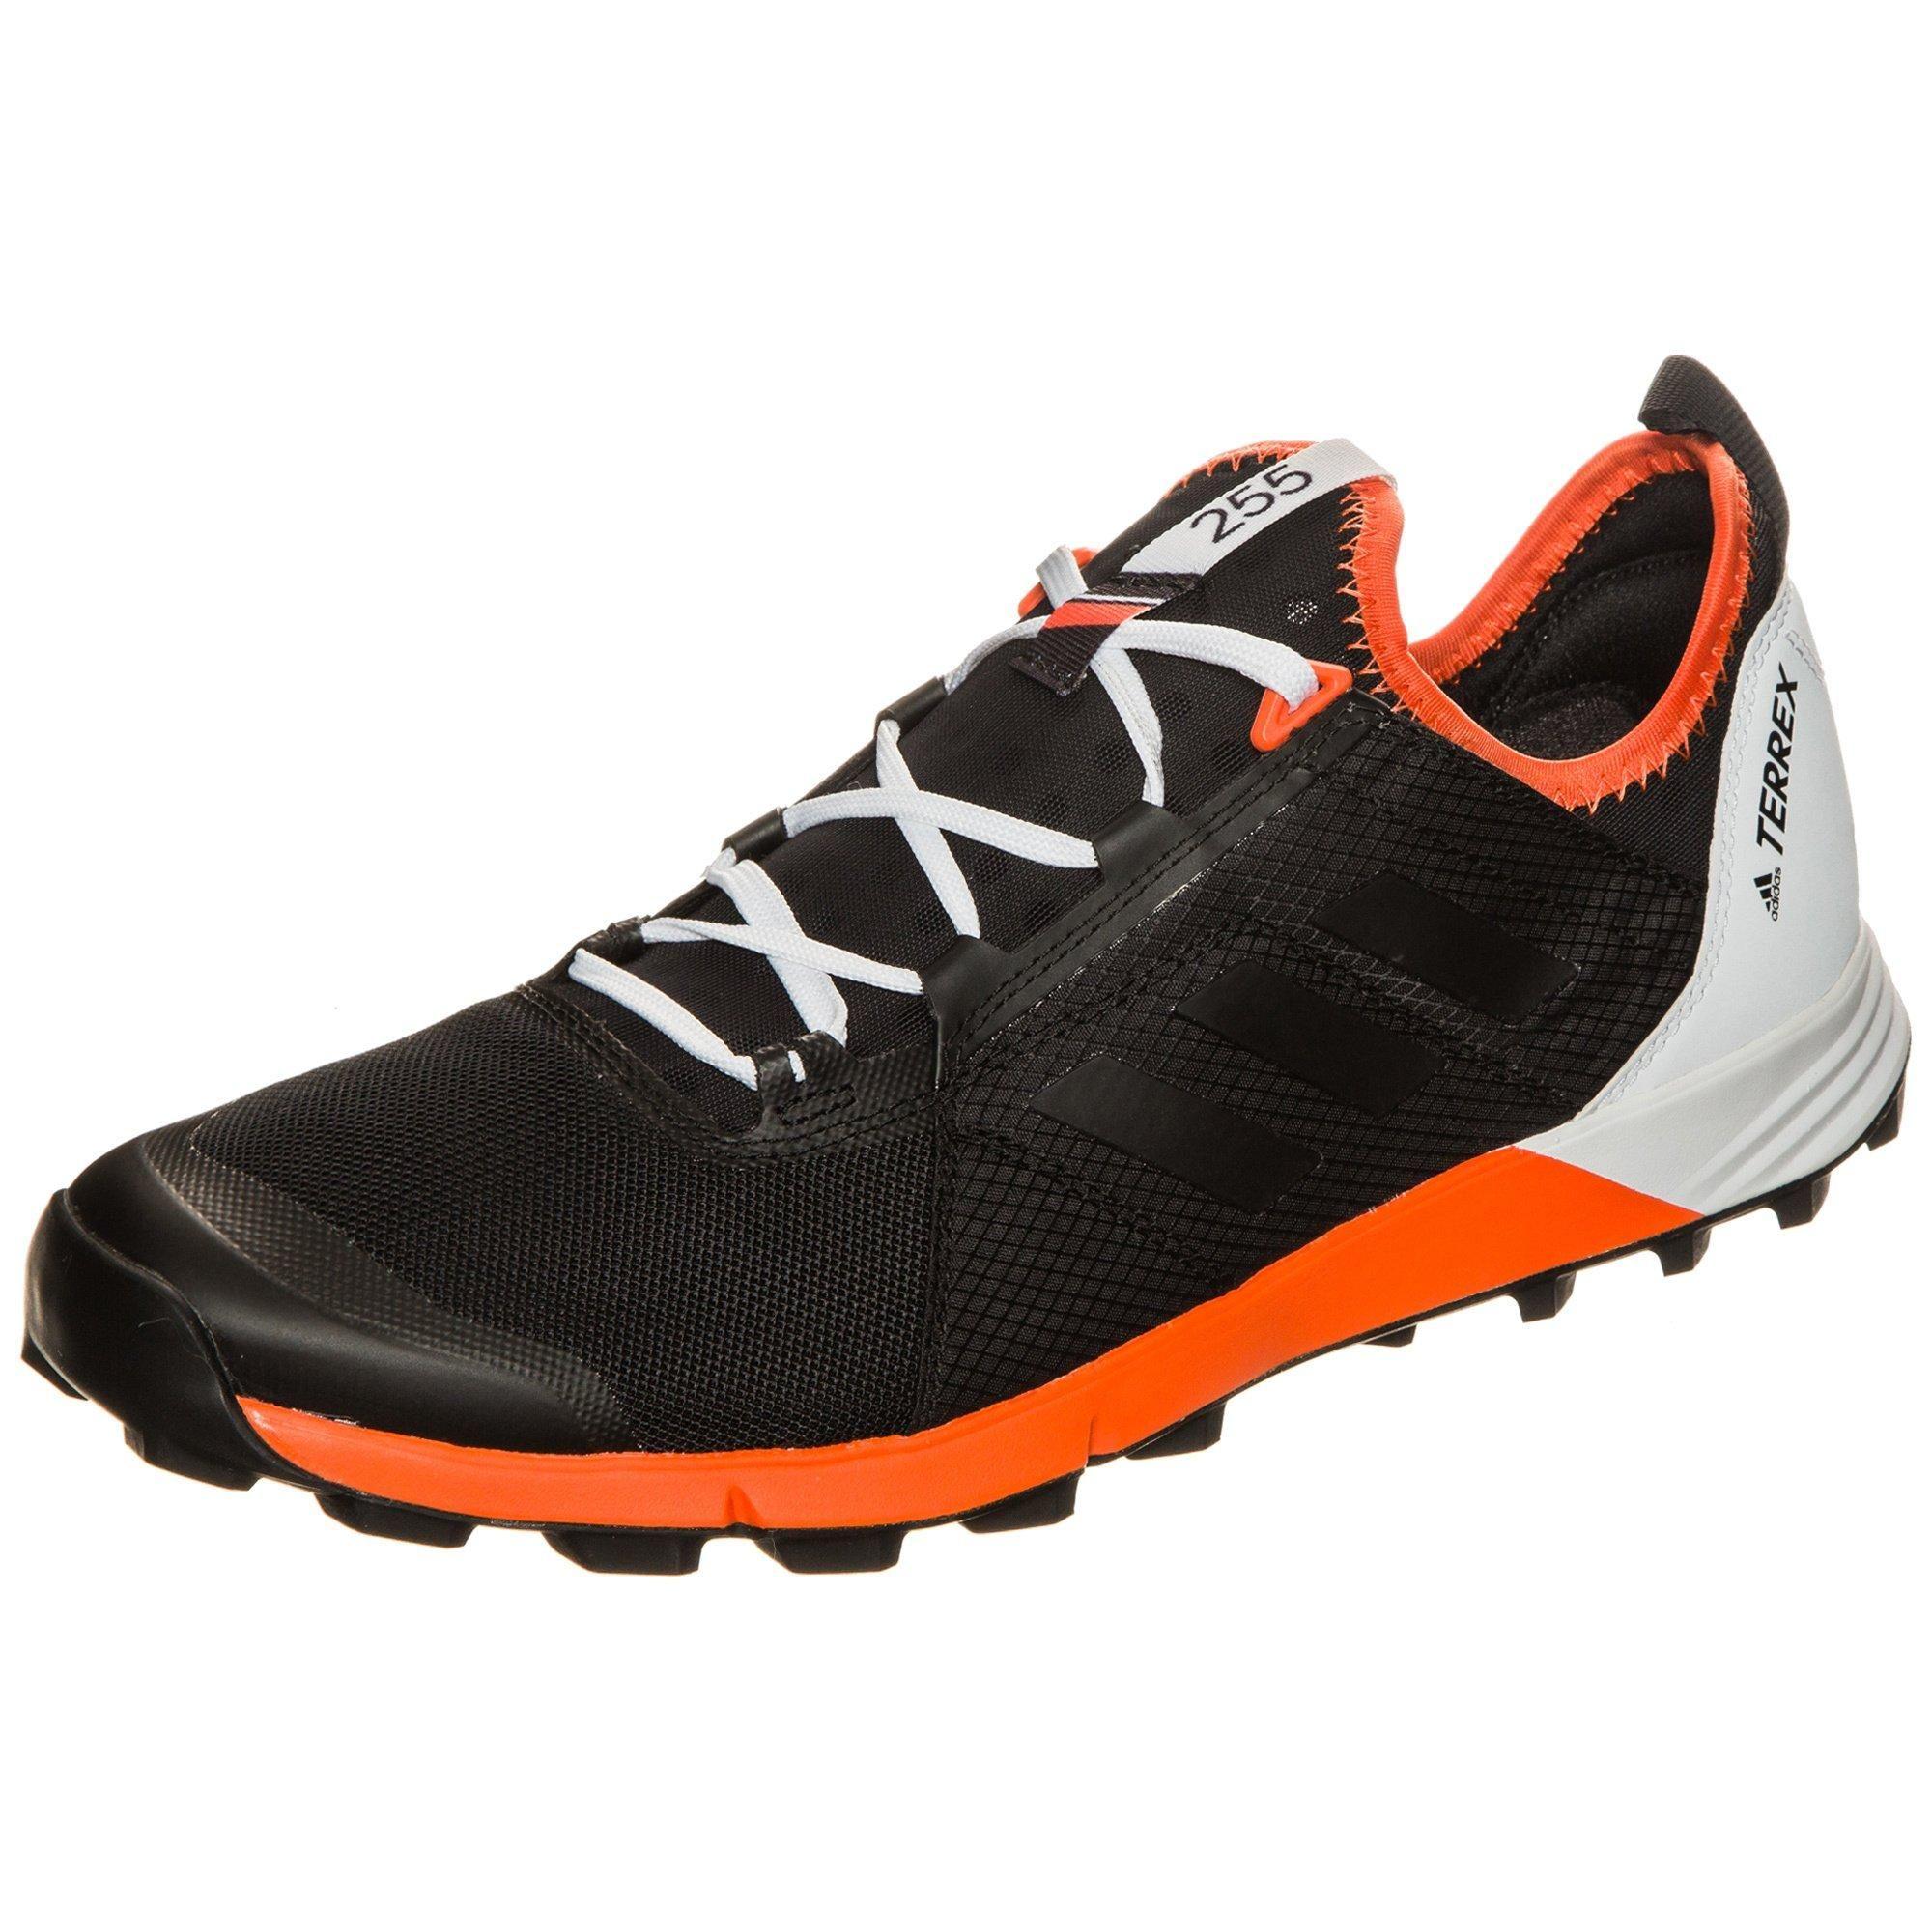 Herren adidas Performance Laufschuh Terrex Agravic Speed